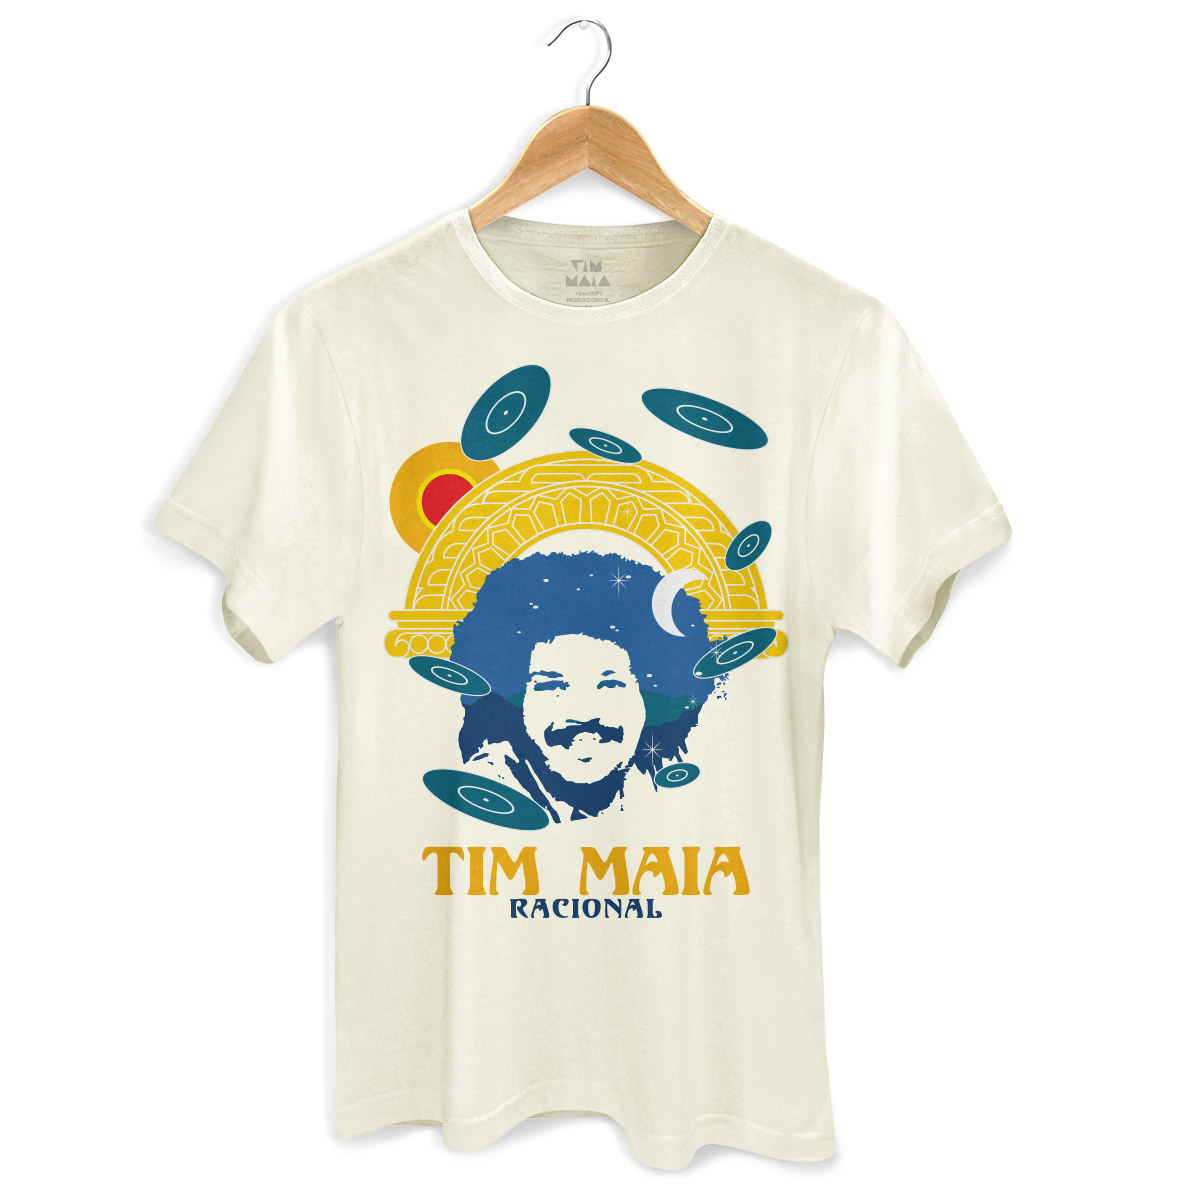 Camiseta Masculina Tim Maia Racional